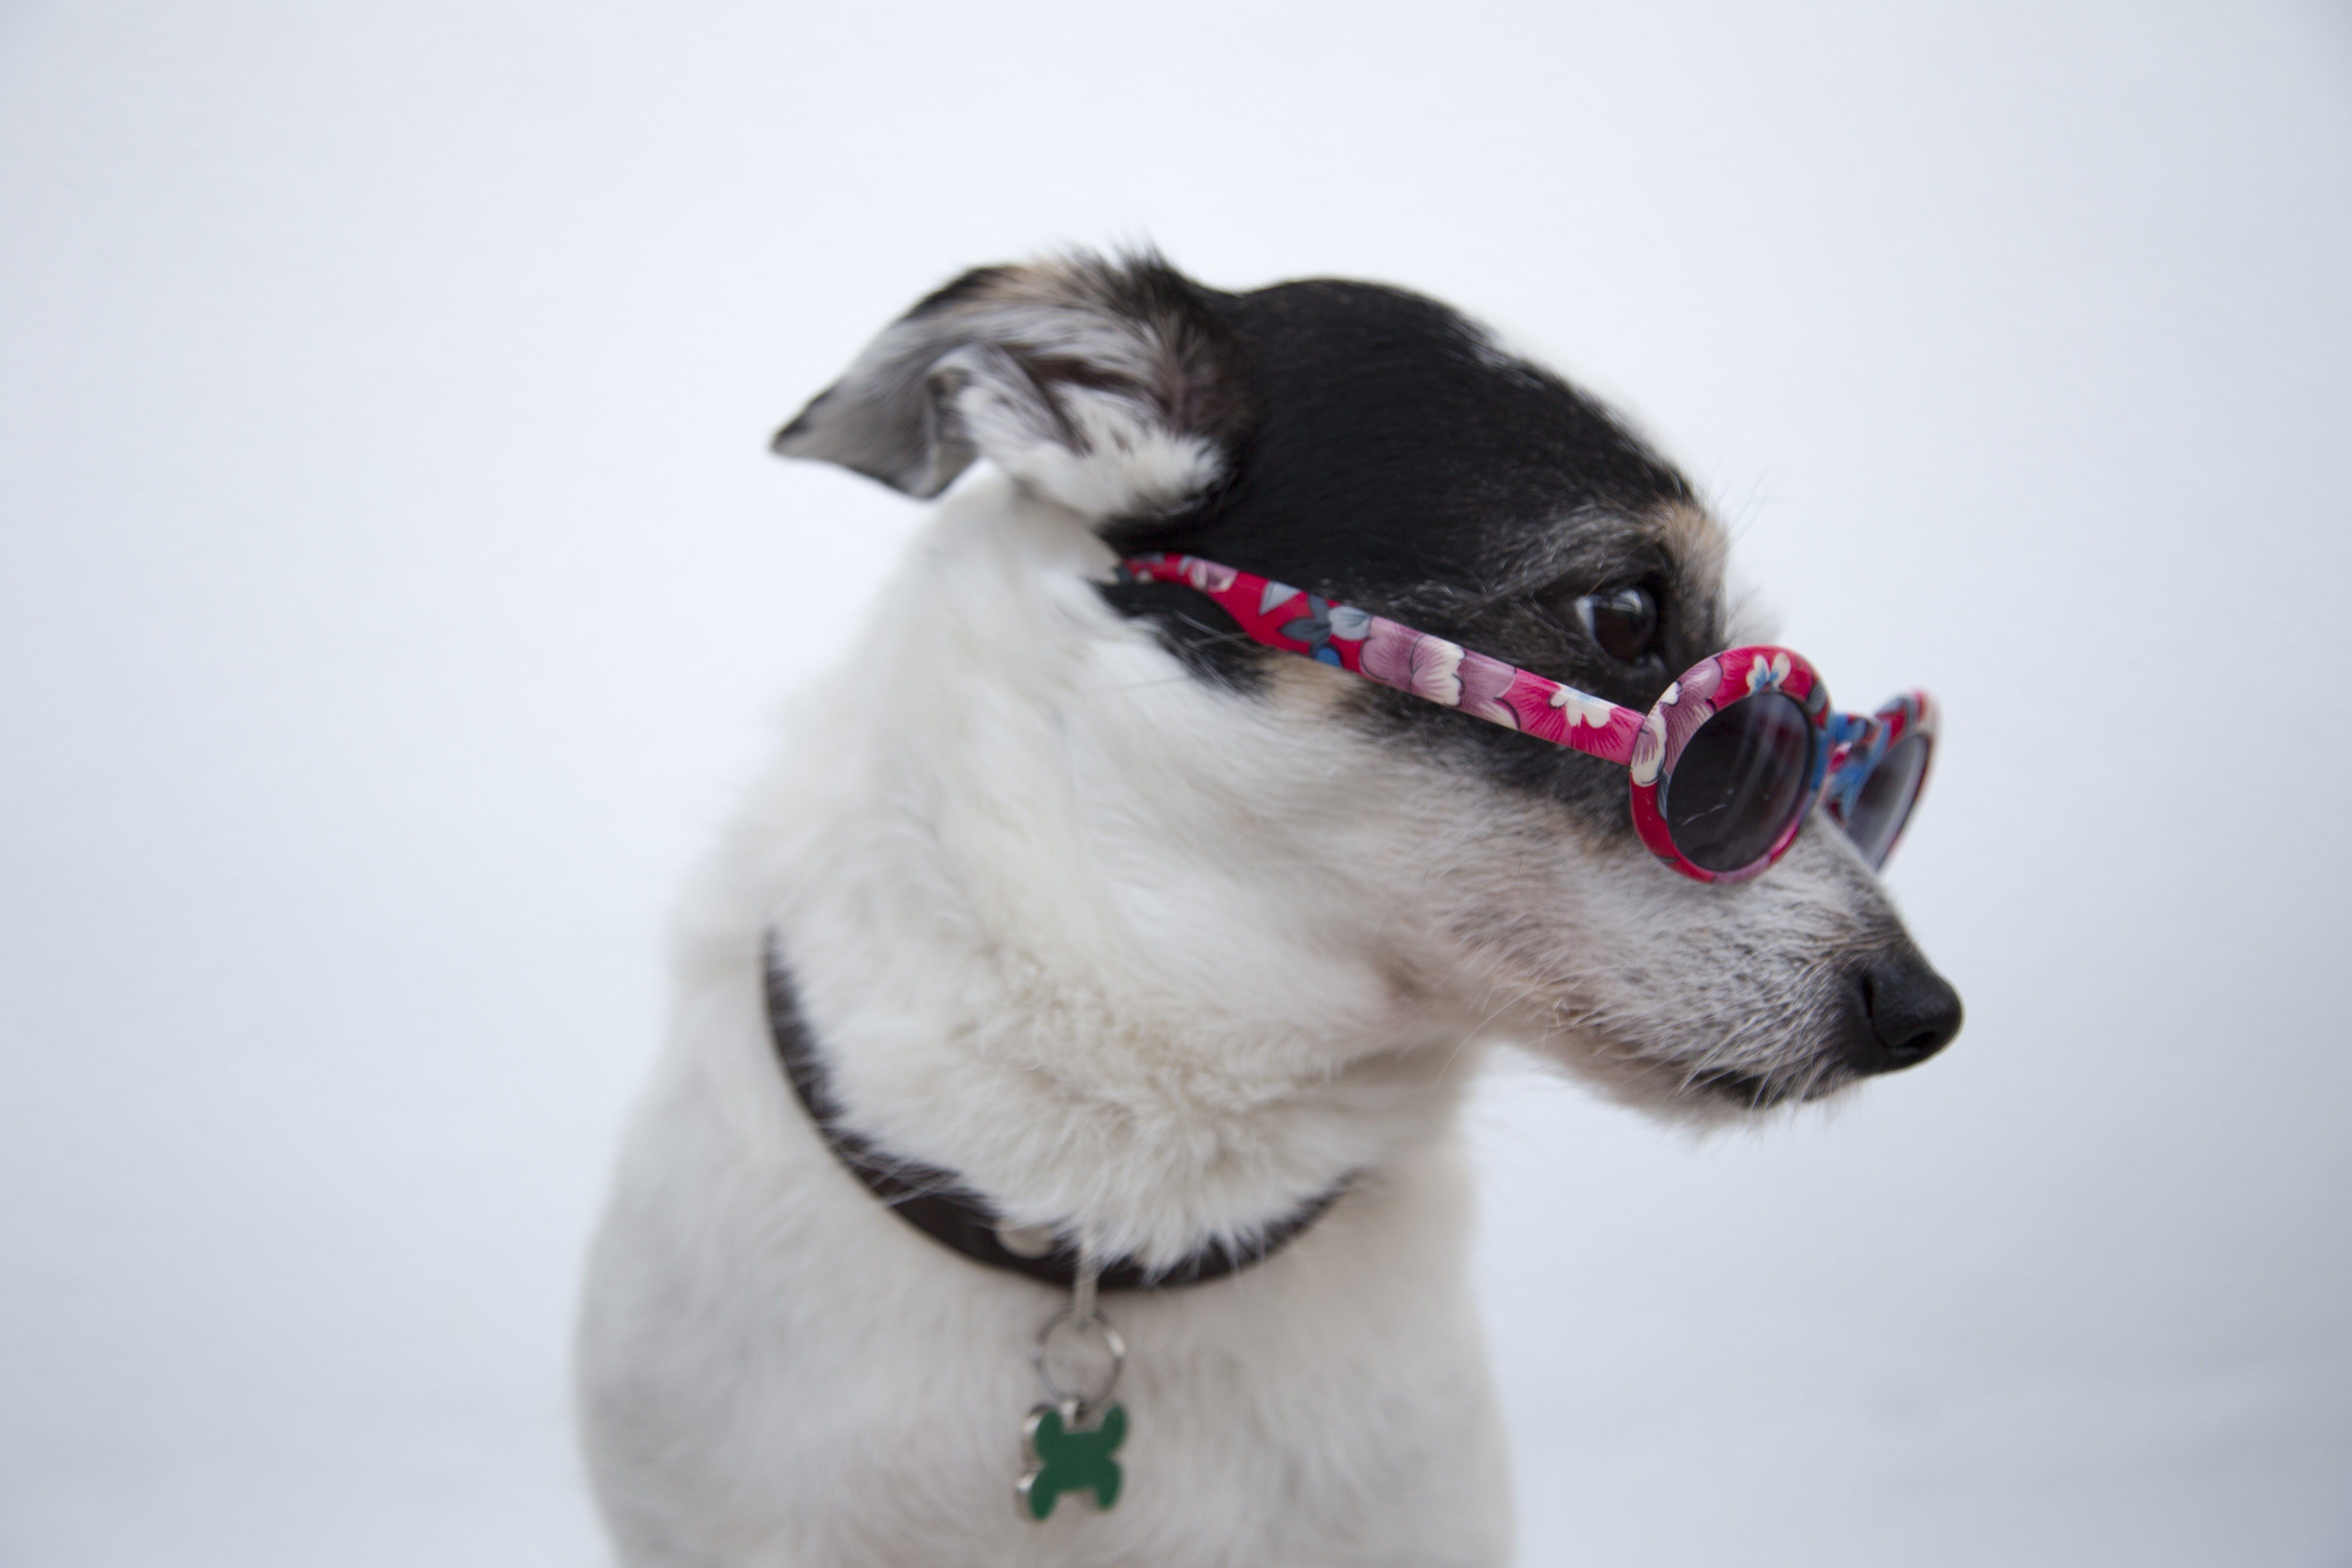 Close-Up Photo Of Dog Wearing Sunglasses